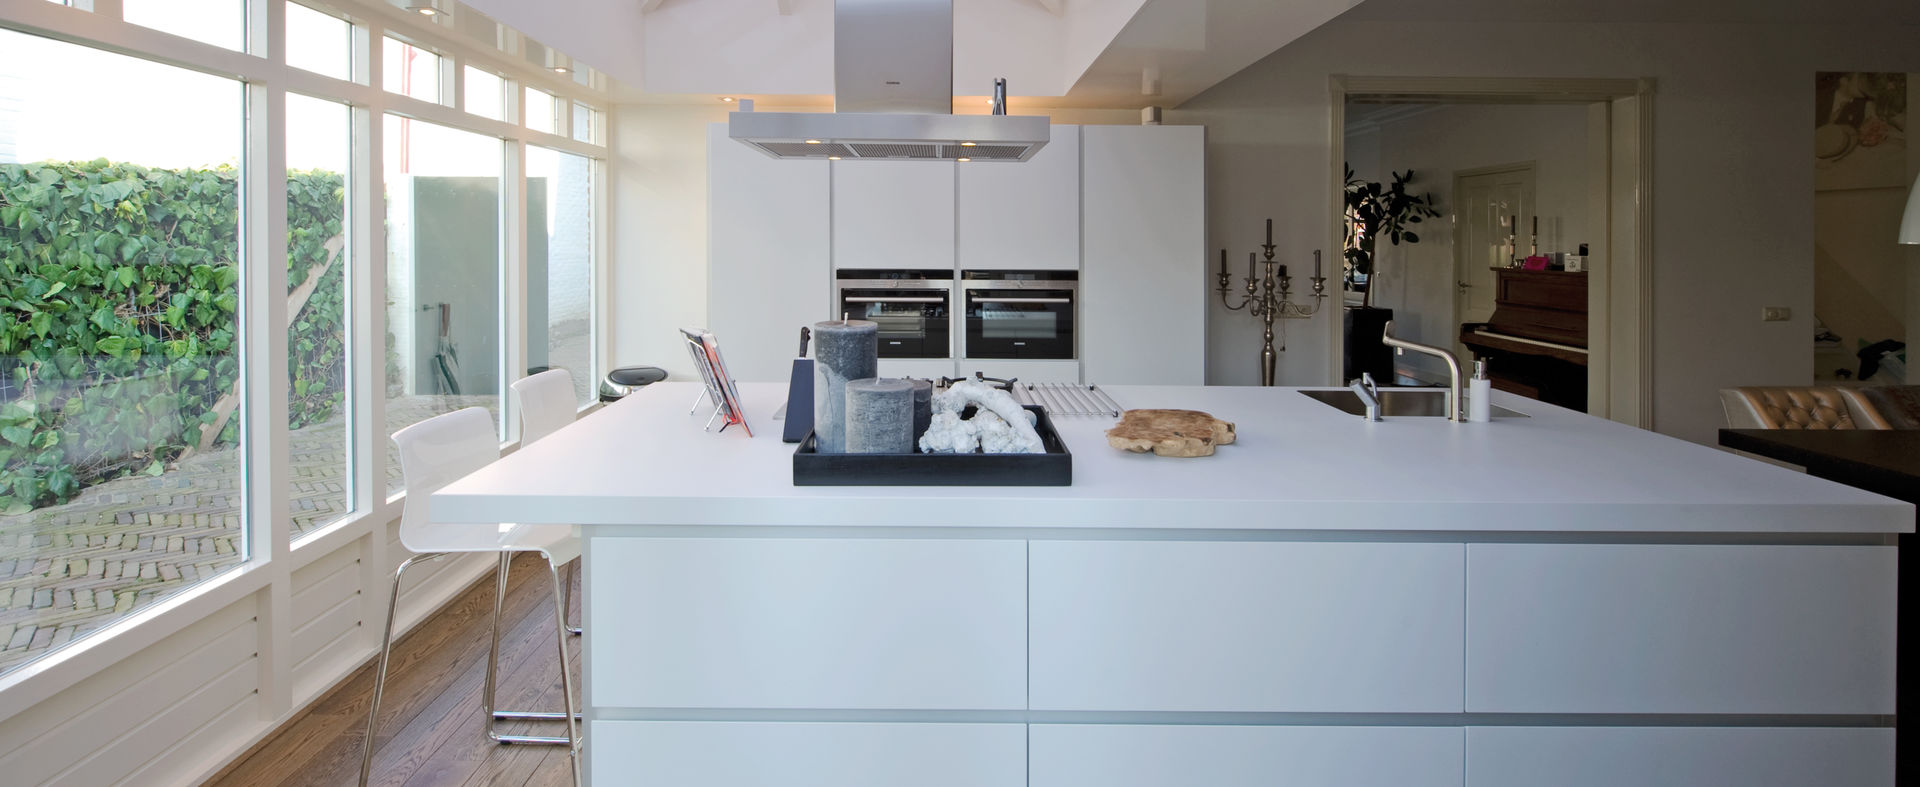 Keuken inclusief bar CVT